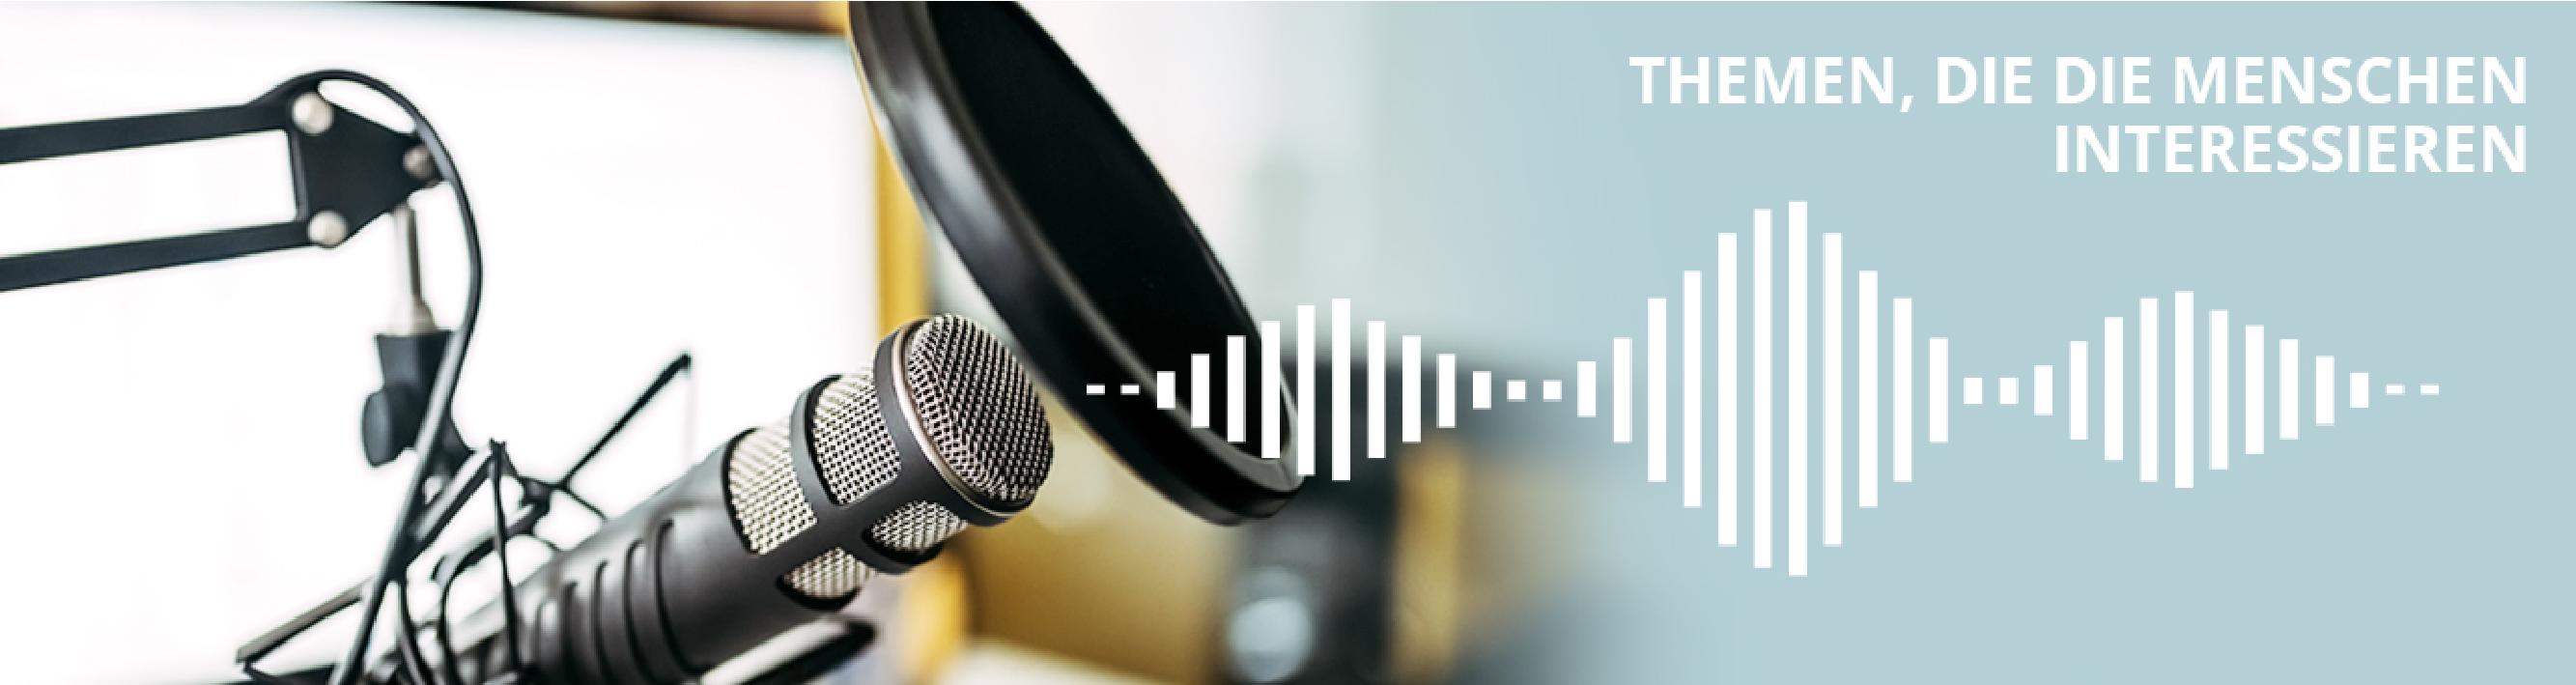 Podcast Banner - ÖGB Podcast